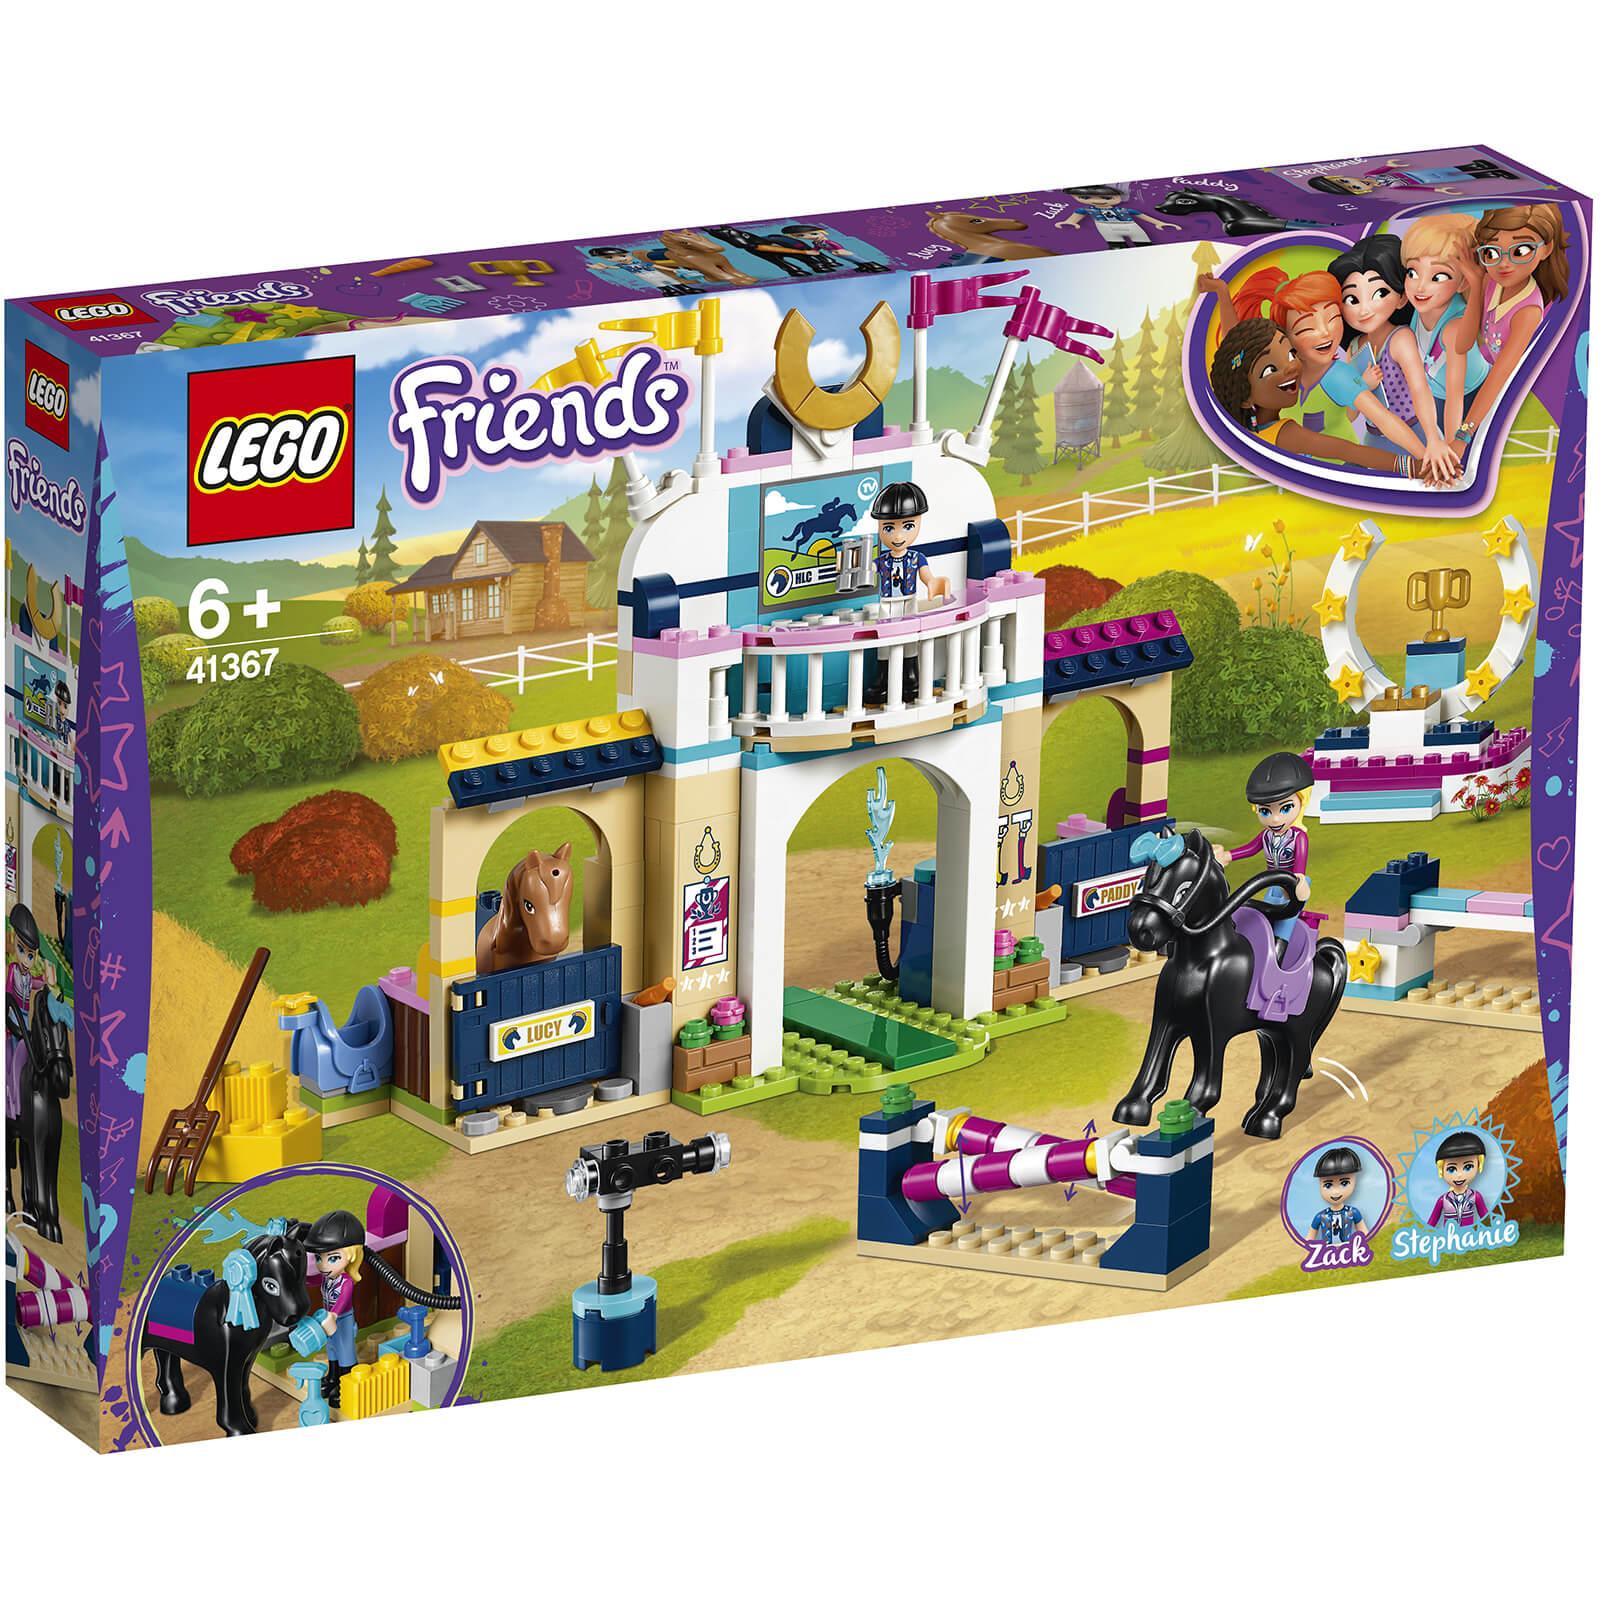 Lego Friends: Stephanie's Horse Jumping (41367)